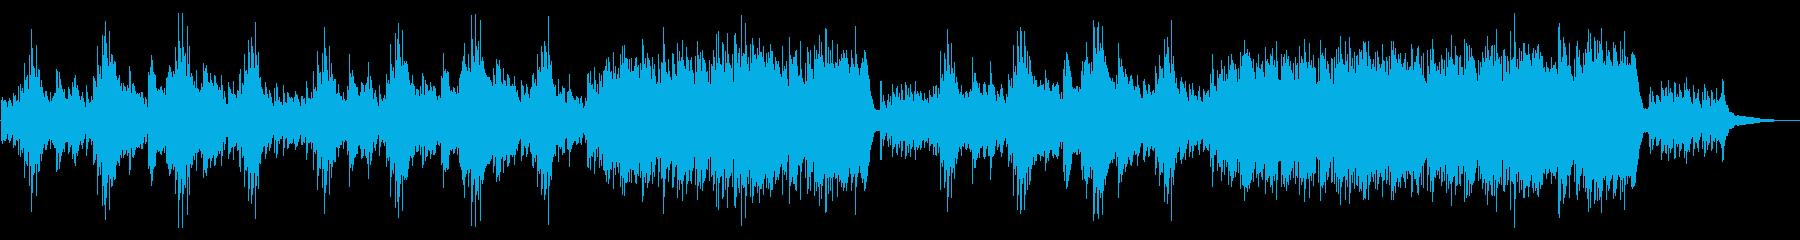 CMやVPに 圧倒的透明感感動弦楽ピアノの再生済みの波形